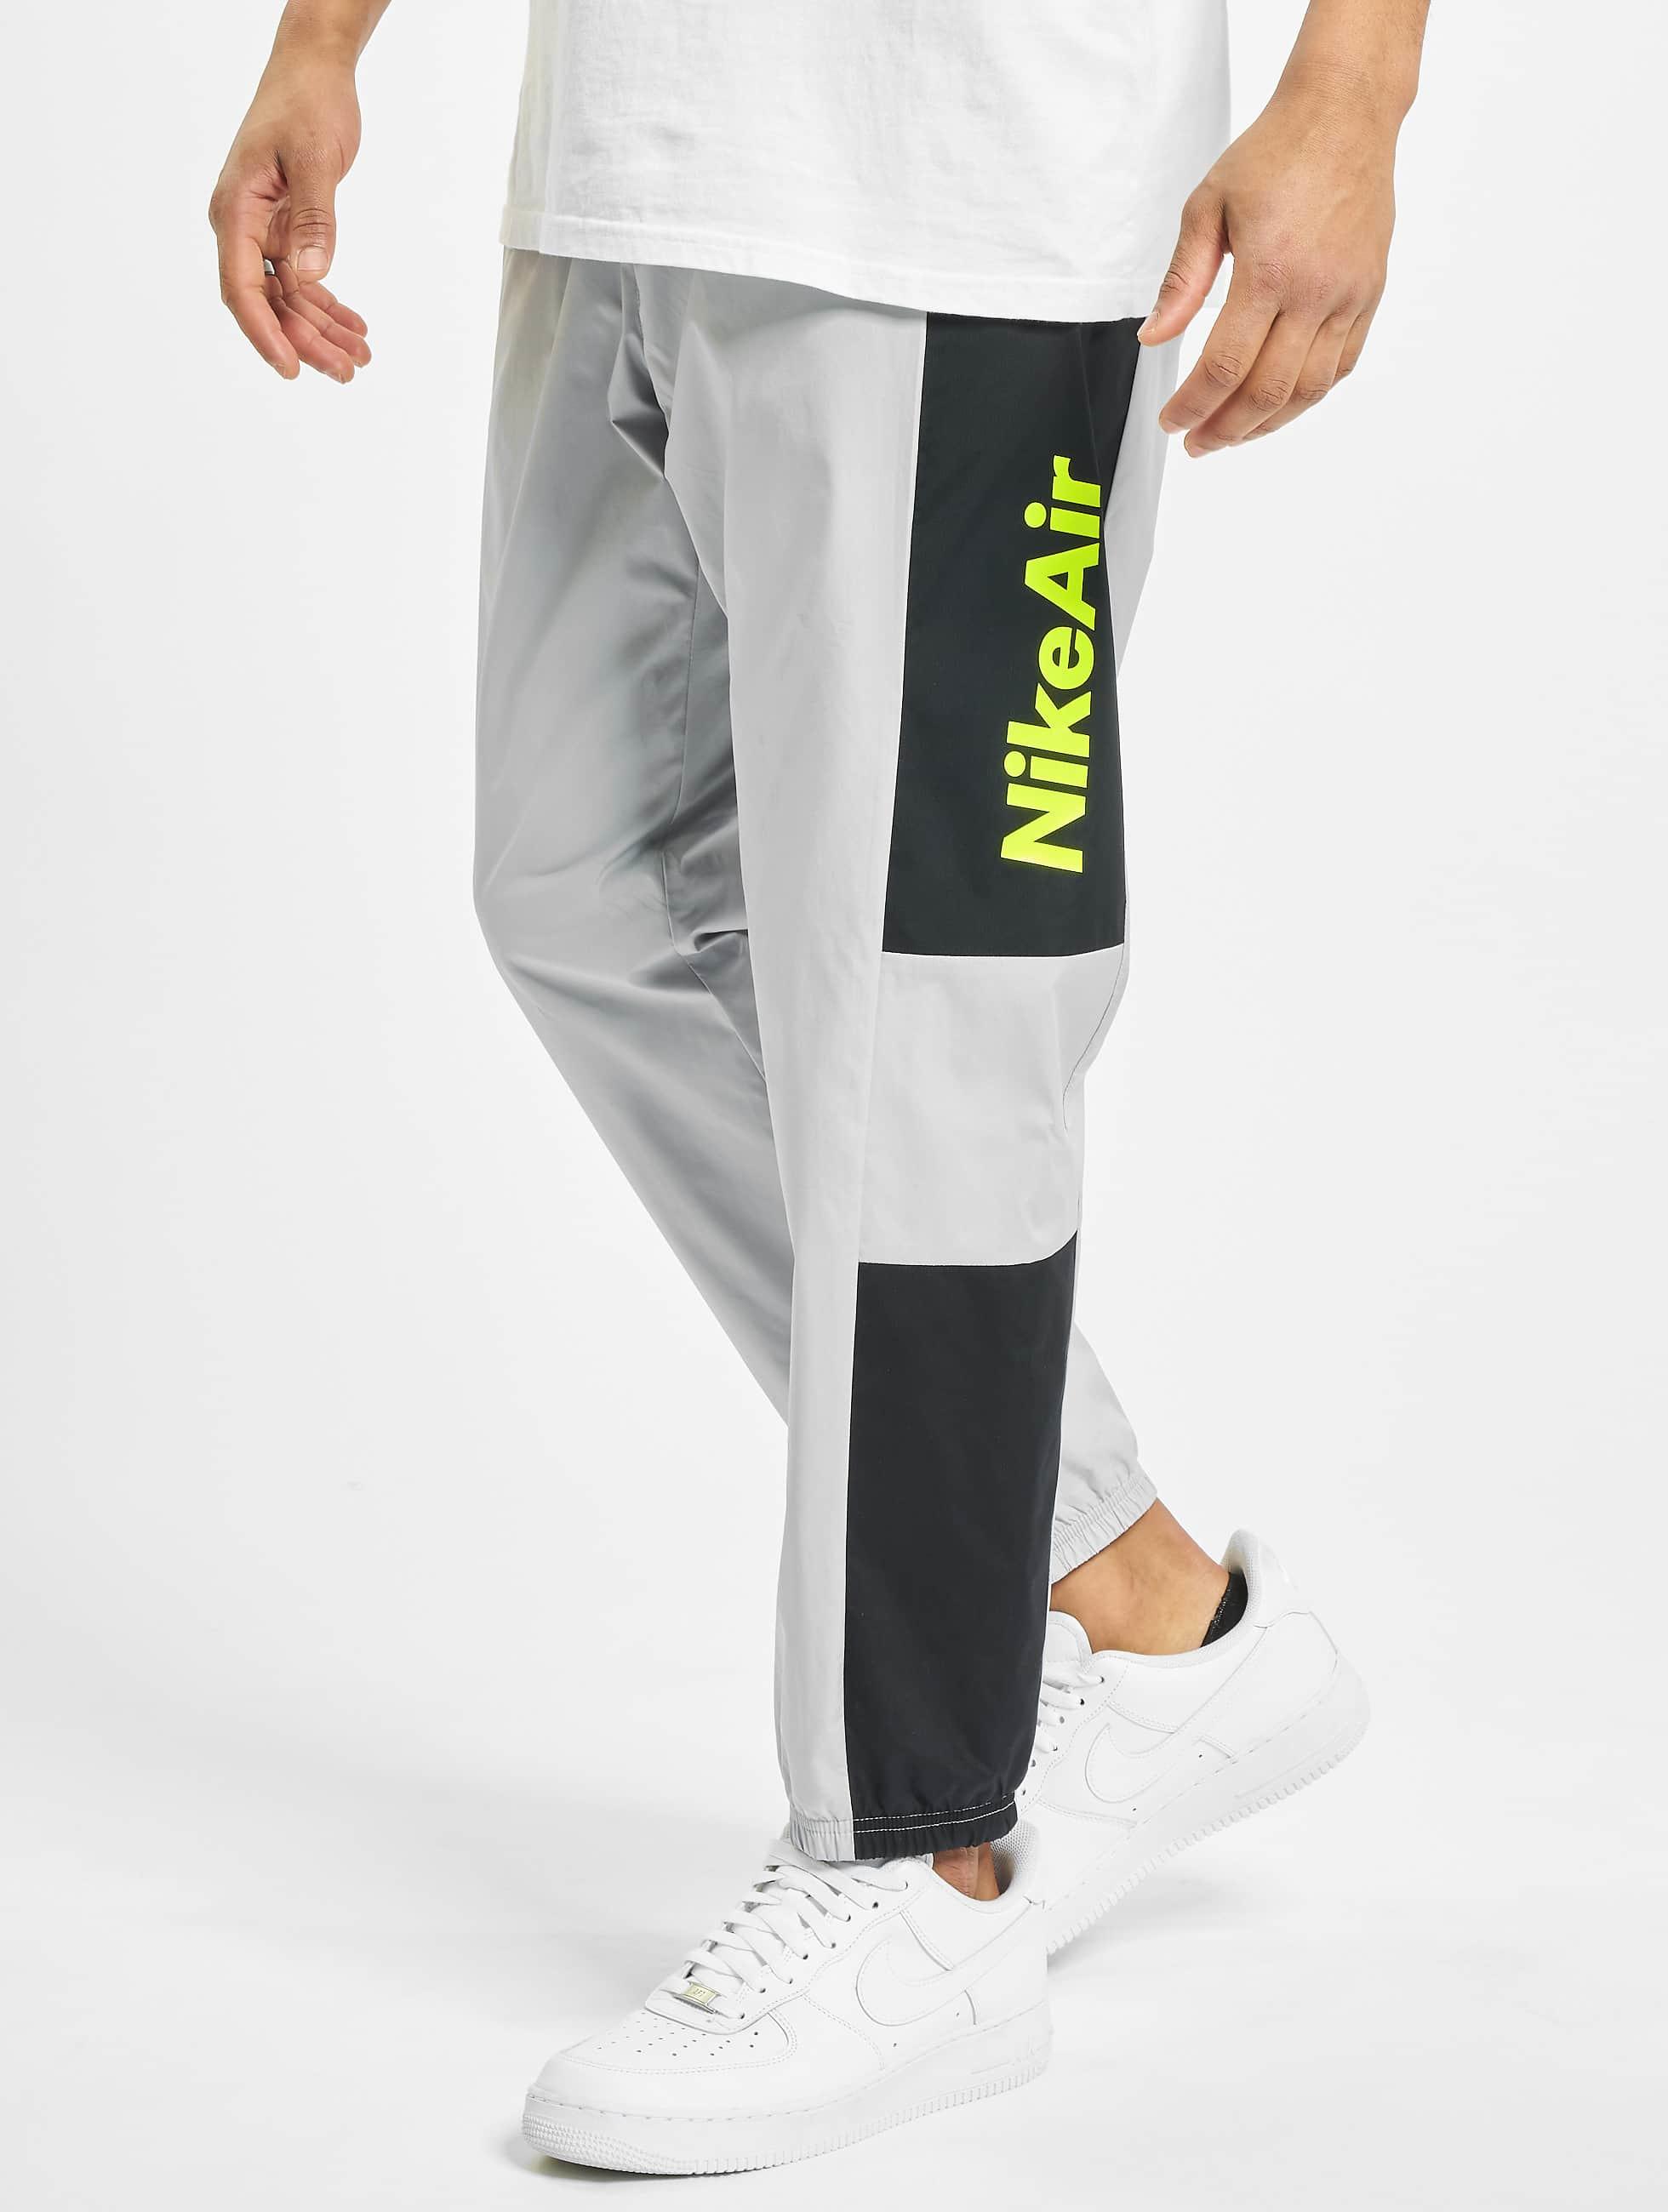 Nike Air Woven Pants Lt Smoke GreyBlackBlackVolt